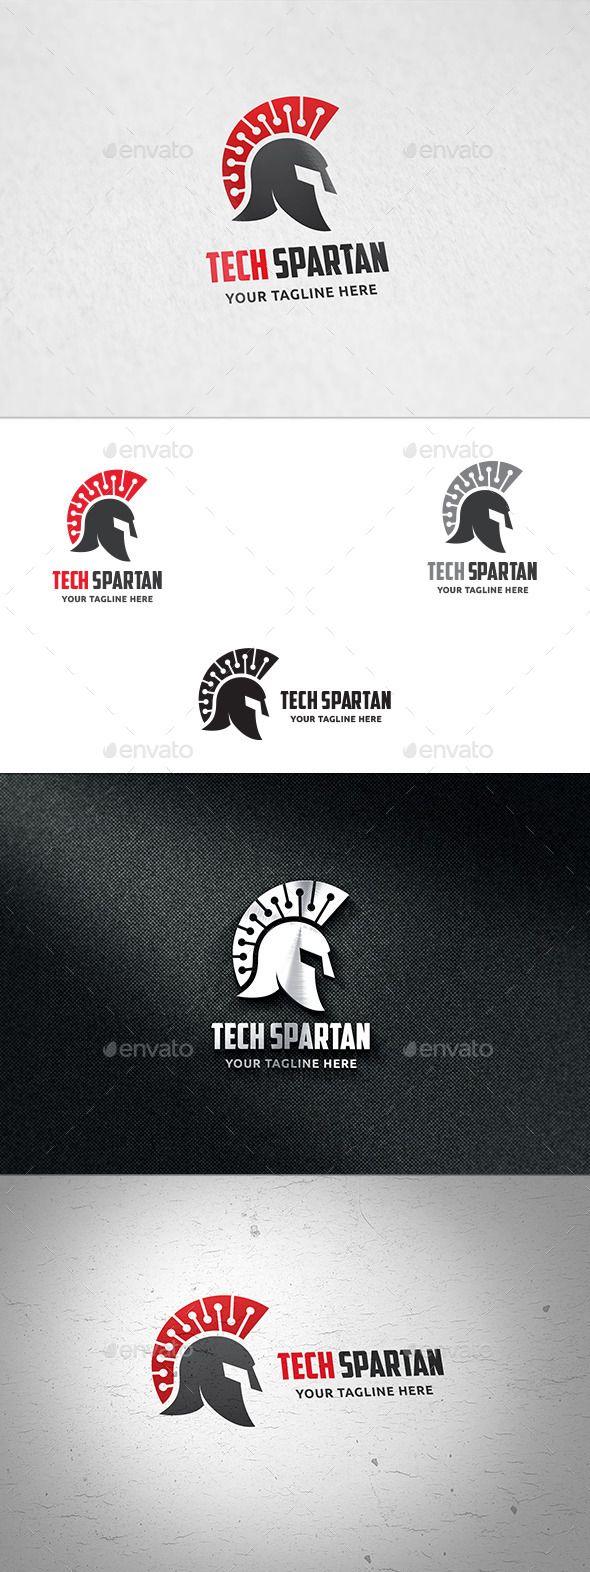 Tech Spartan Logo   Pinterest